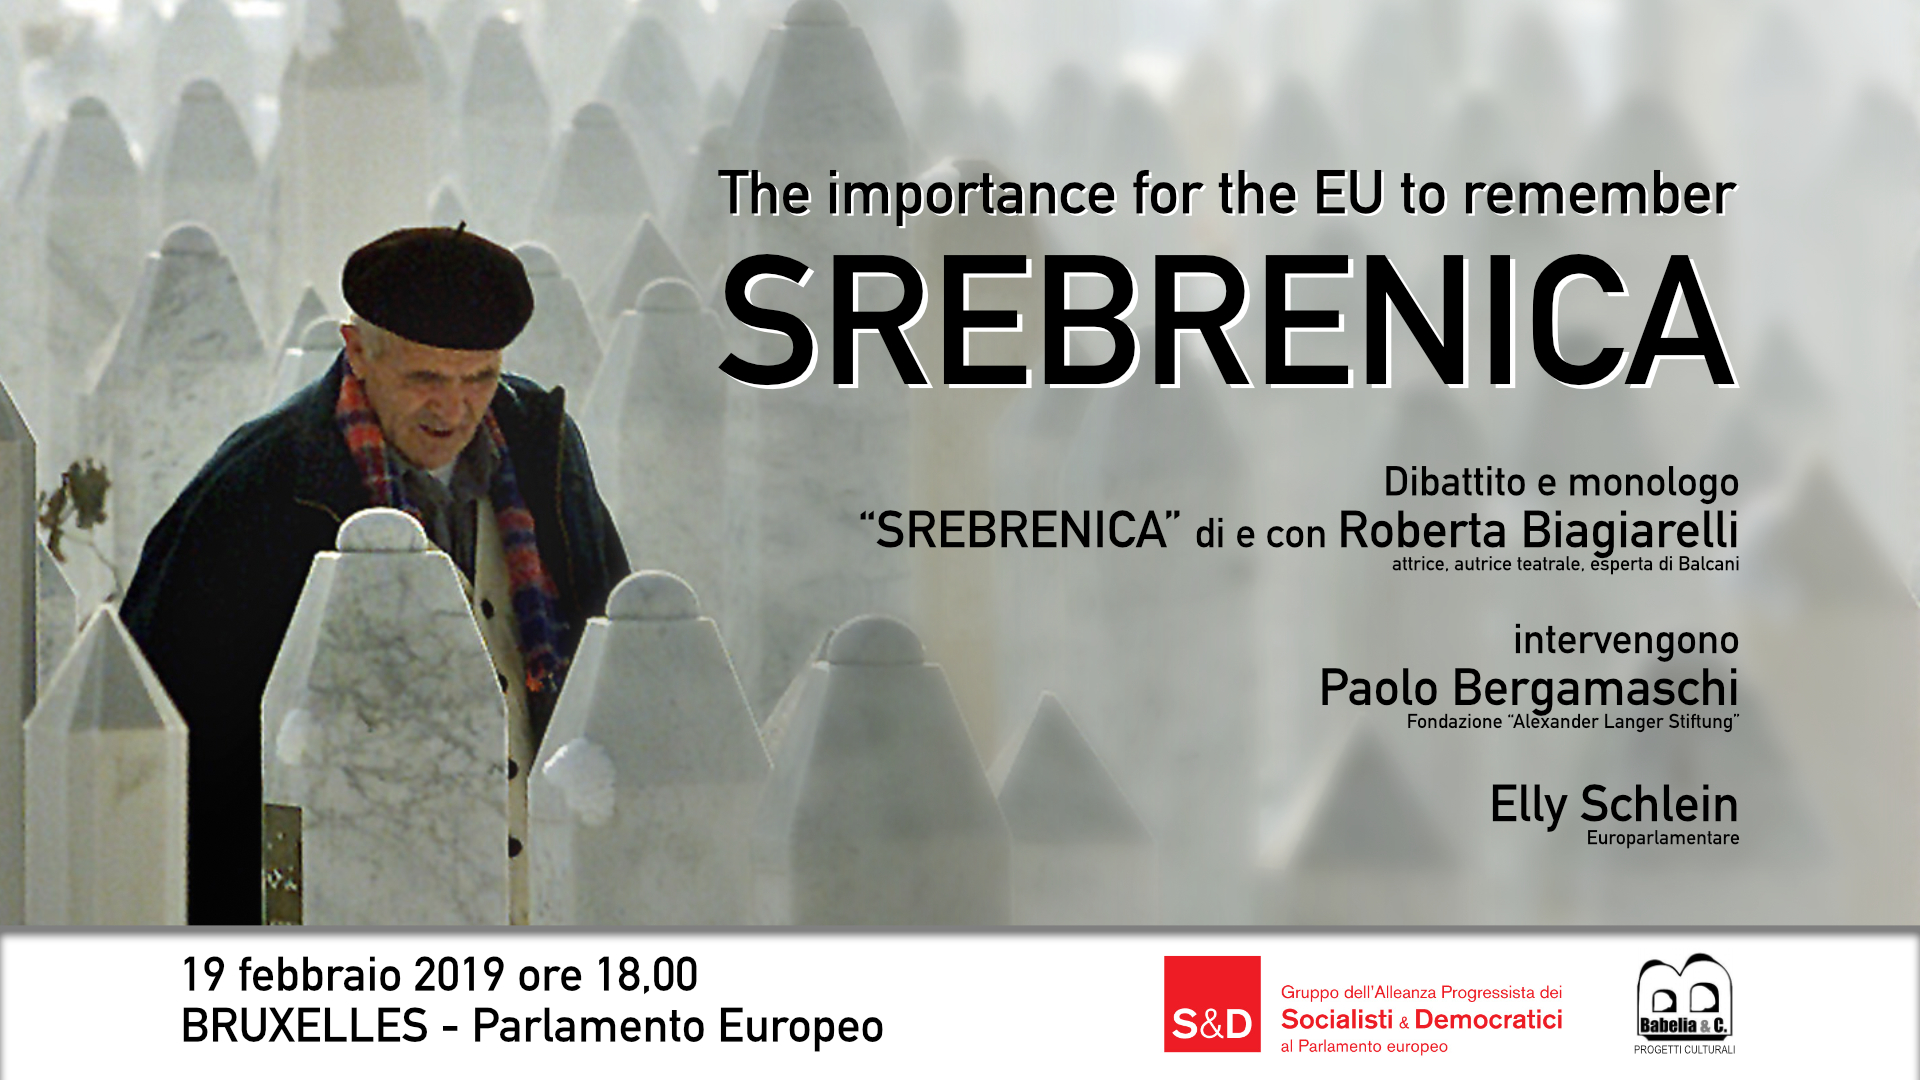 Srebrenica - The importance for EU to remember